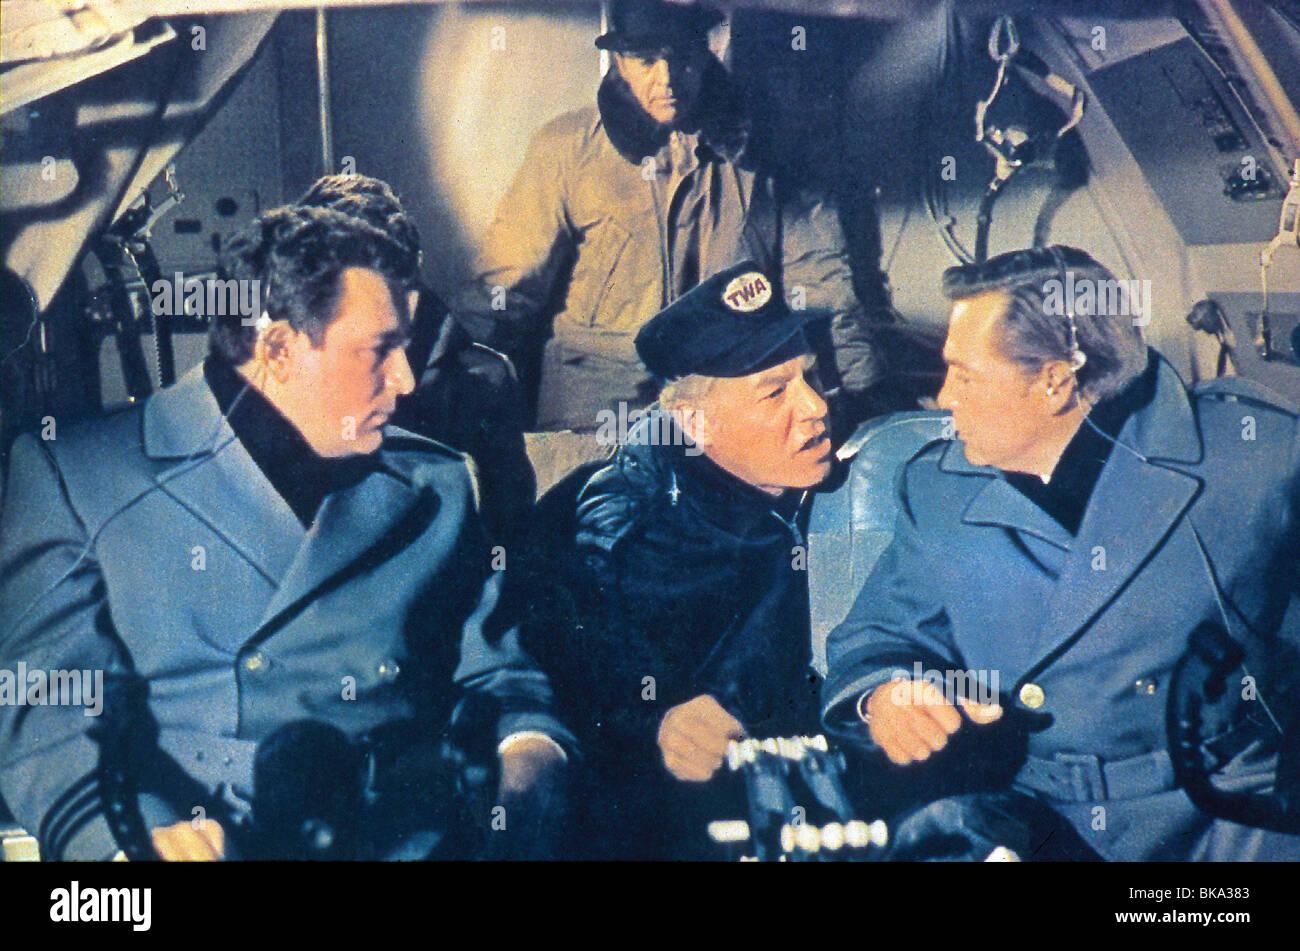 AIRPORT (1970) BURT LANCASTER, GEORGE KENNEDY COCKPIT, PILOTS, HEADSET AIPT 005 - Stock Image